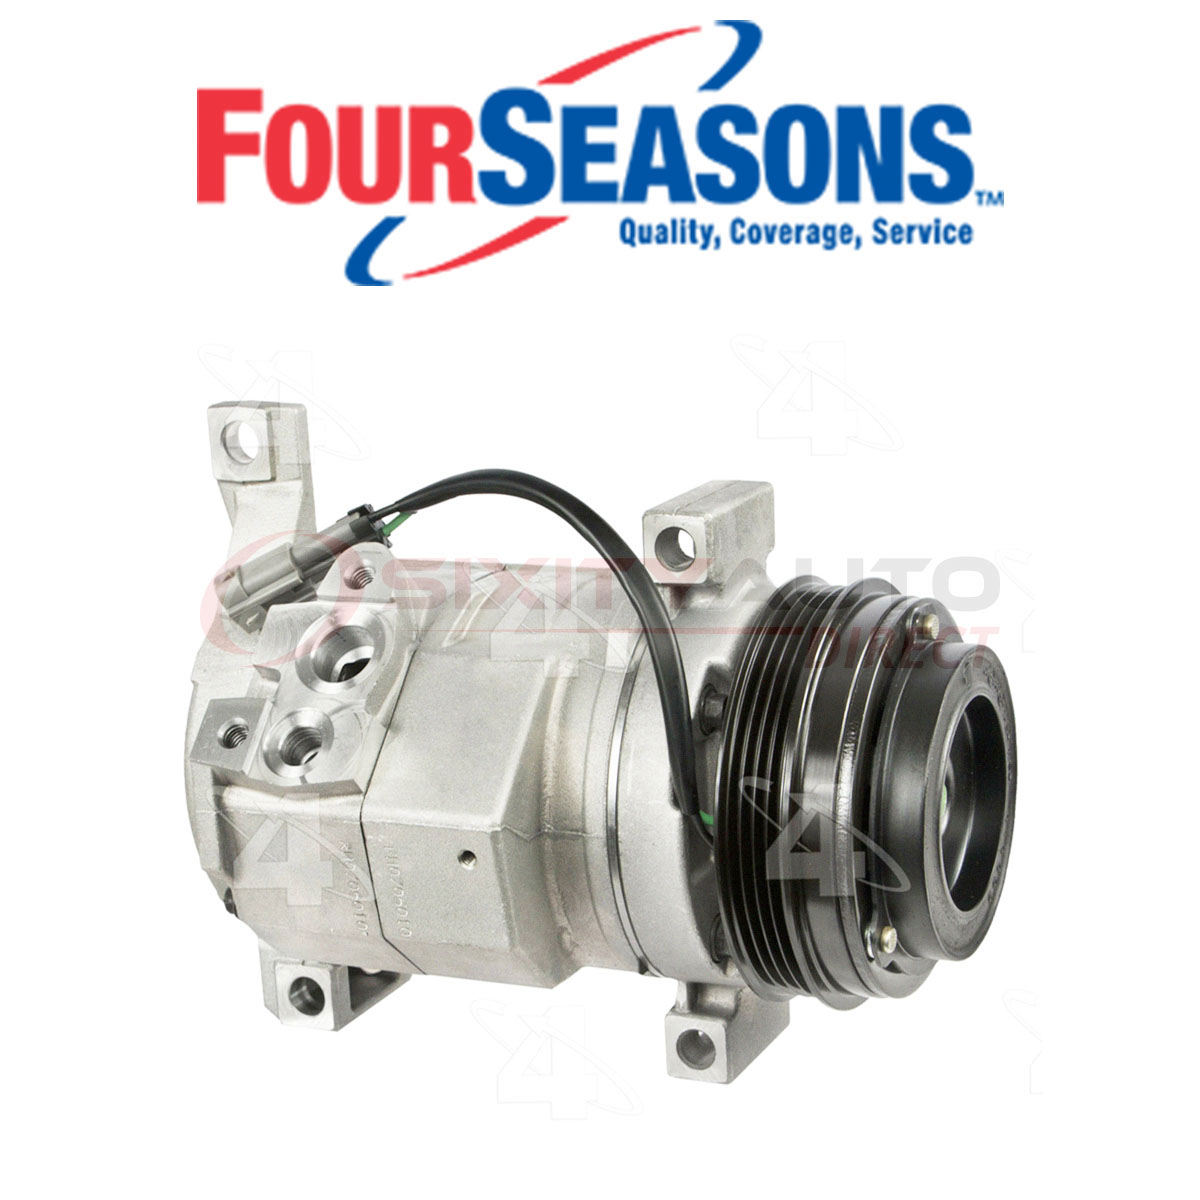 For 2003-2011 Chevrolet Silverado 2500 HD A//C Compressor 47112QR 2006 2004 2005